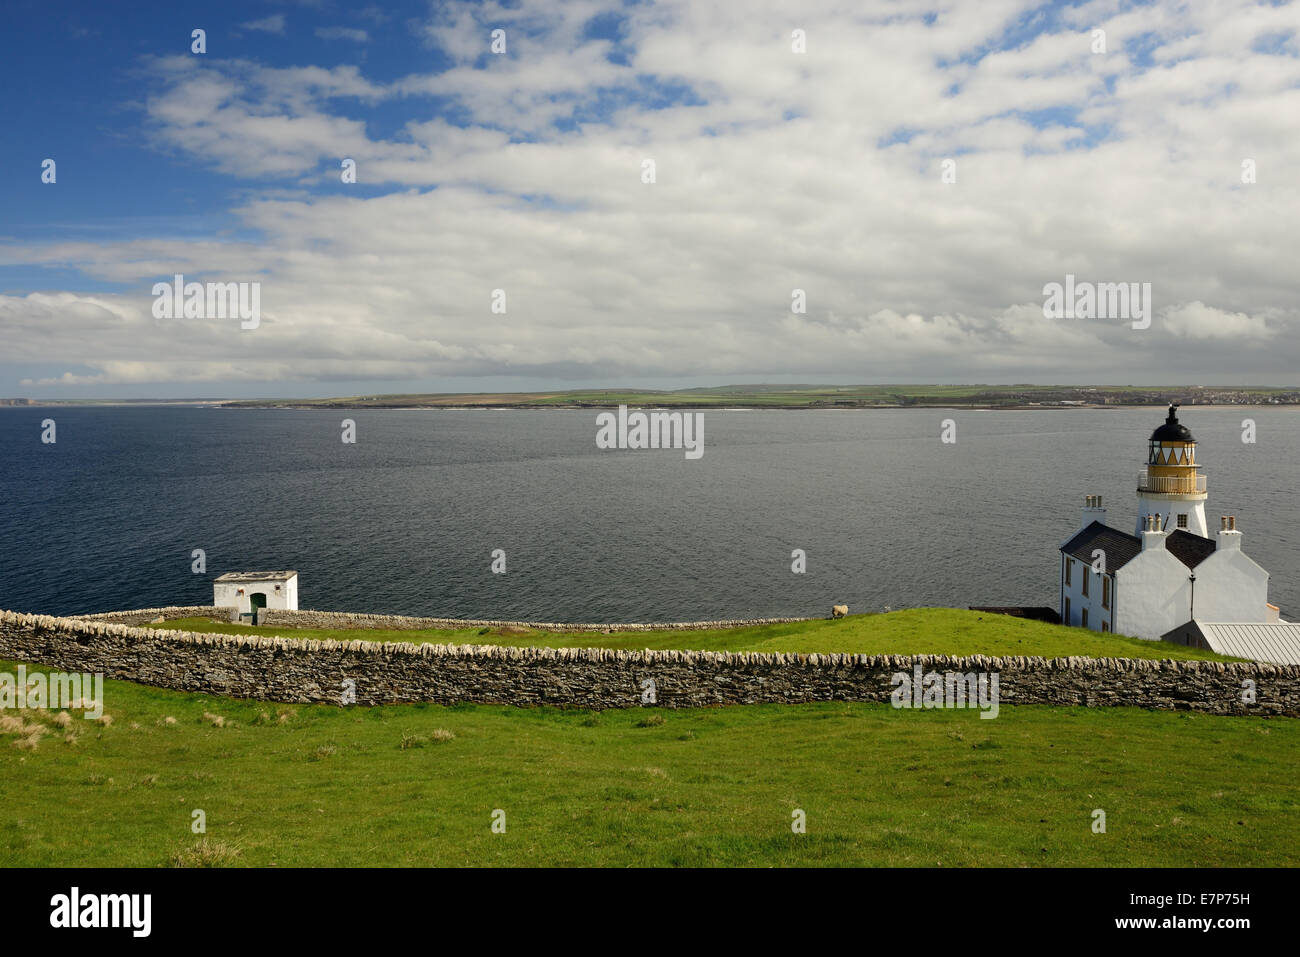 Holborn Head lighthouse, overlooking Thurso and Thurso Bay, Caithness, Scotland. - Stock Image